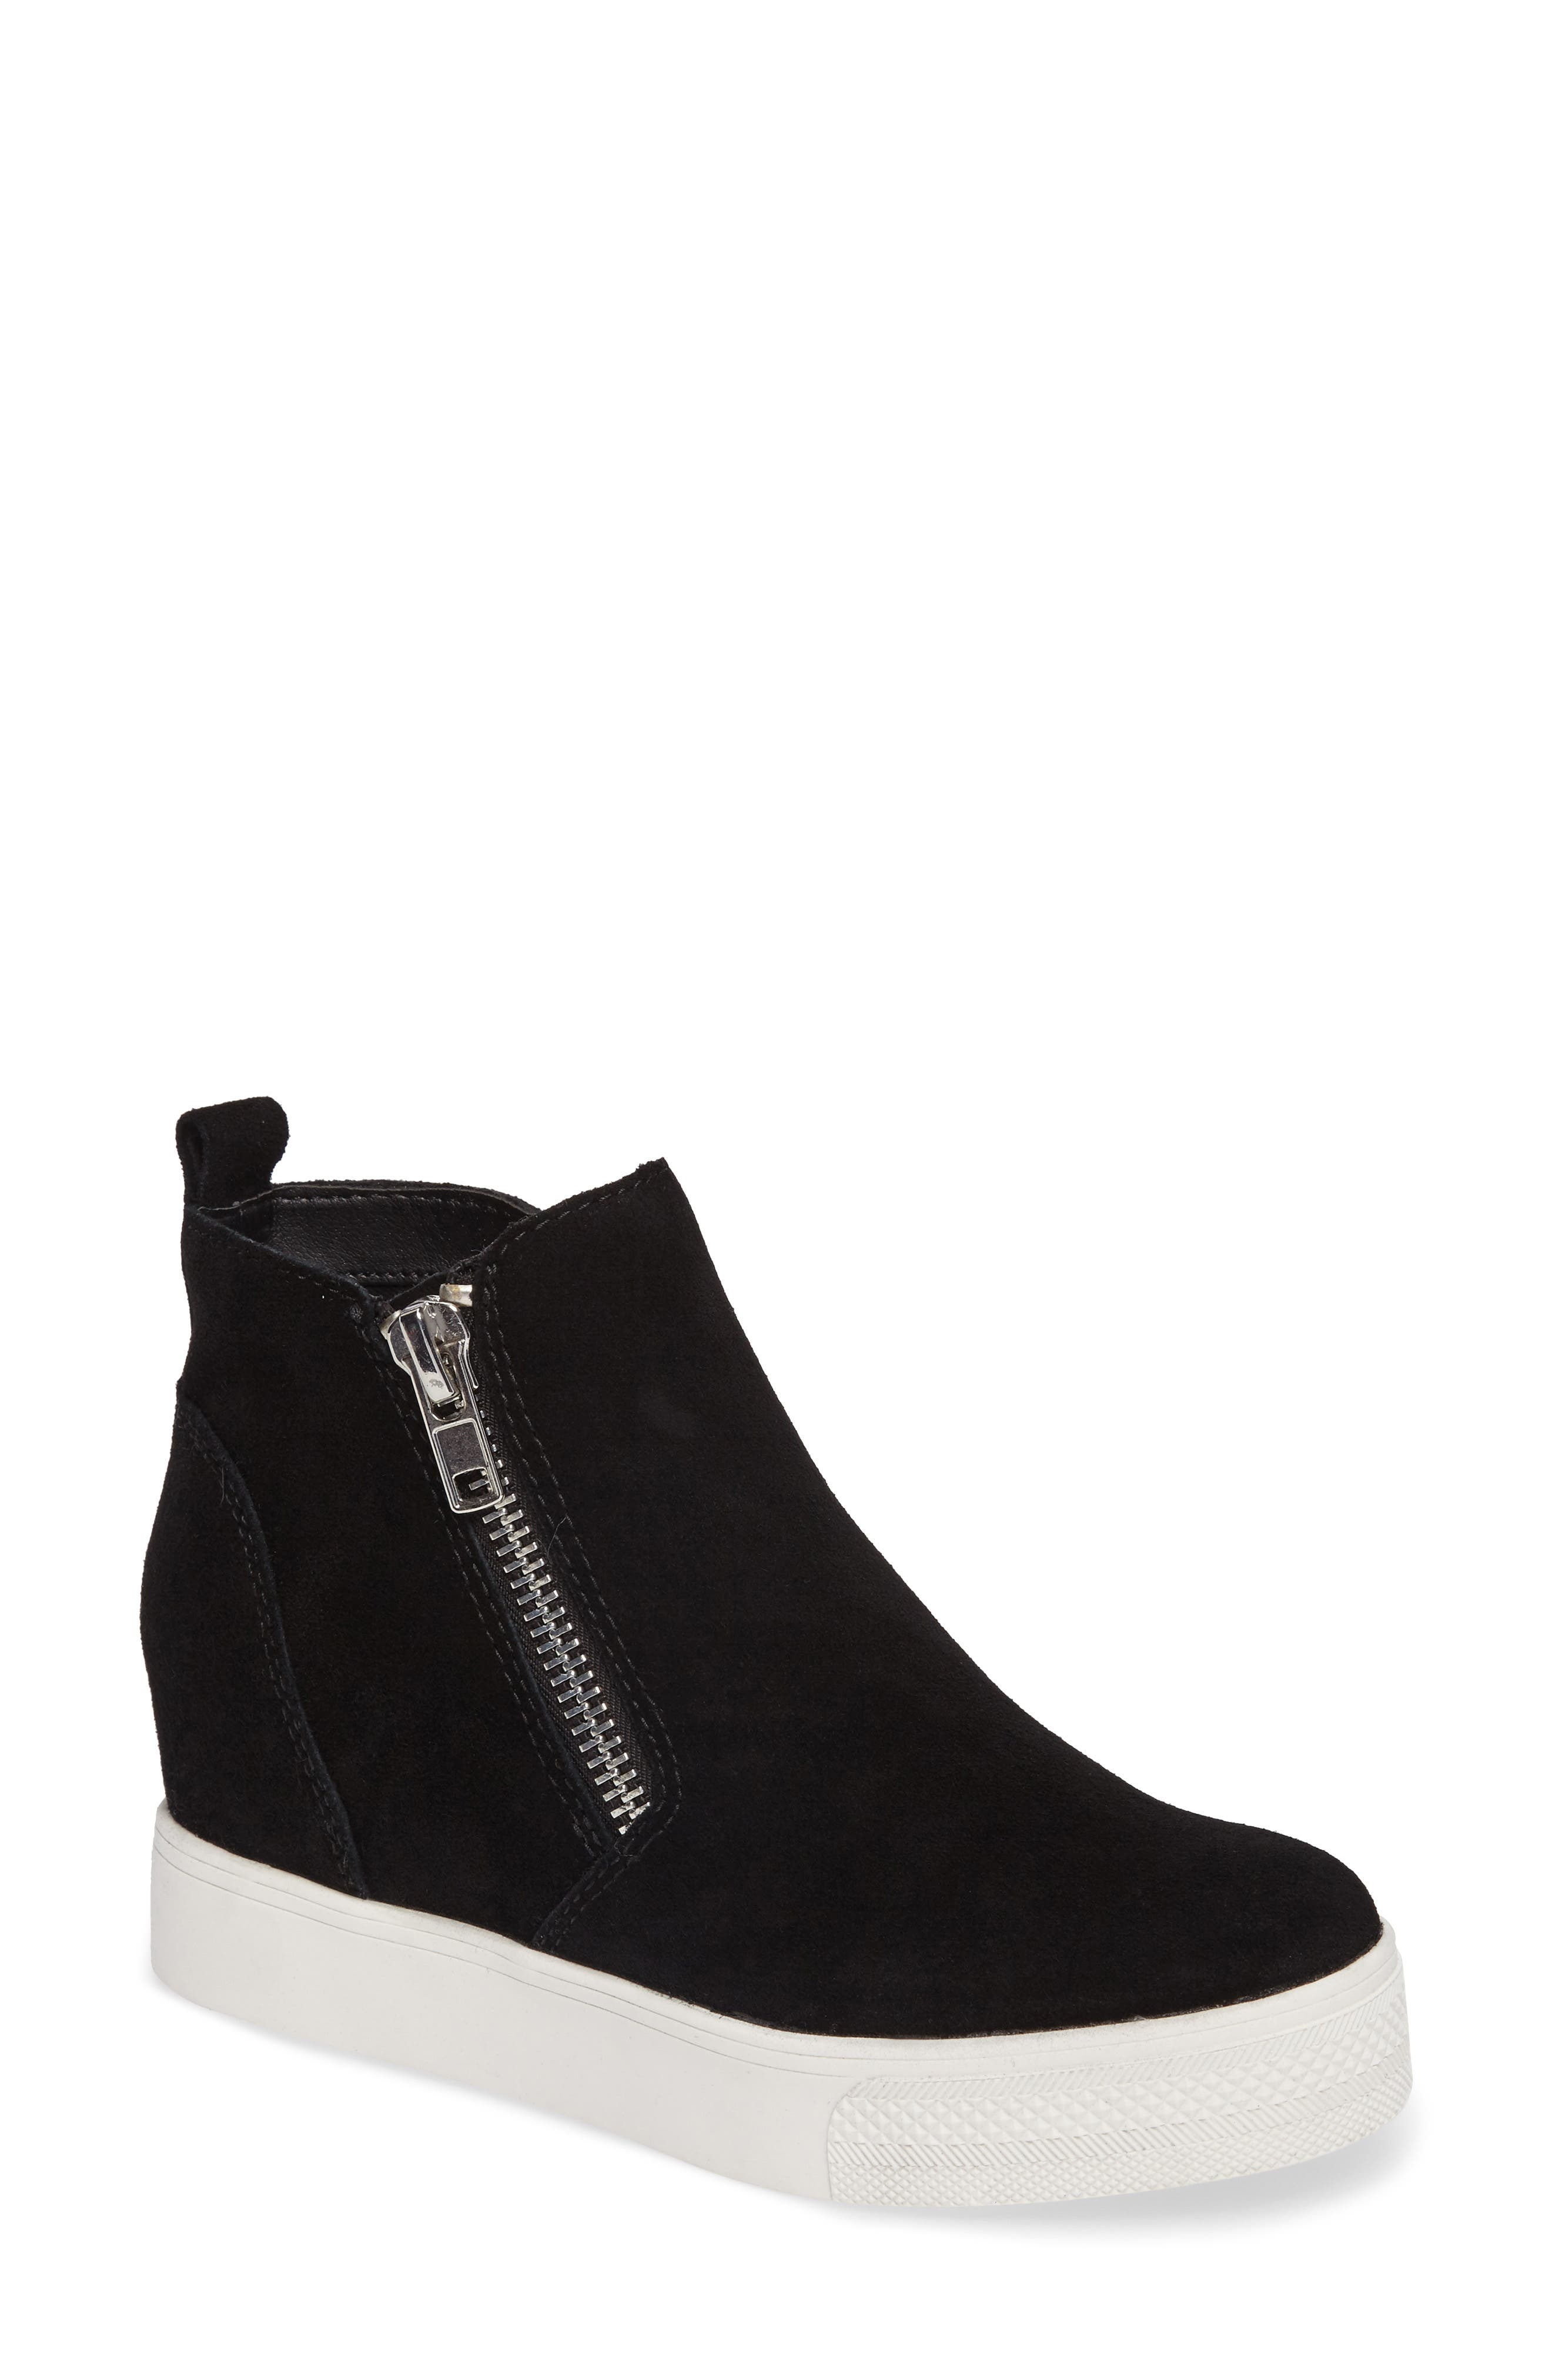 Wedgie High Top Platform Sneaker, Main, color, BLACK SUEDE